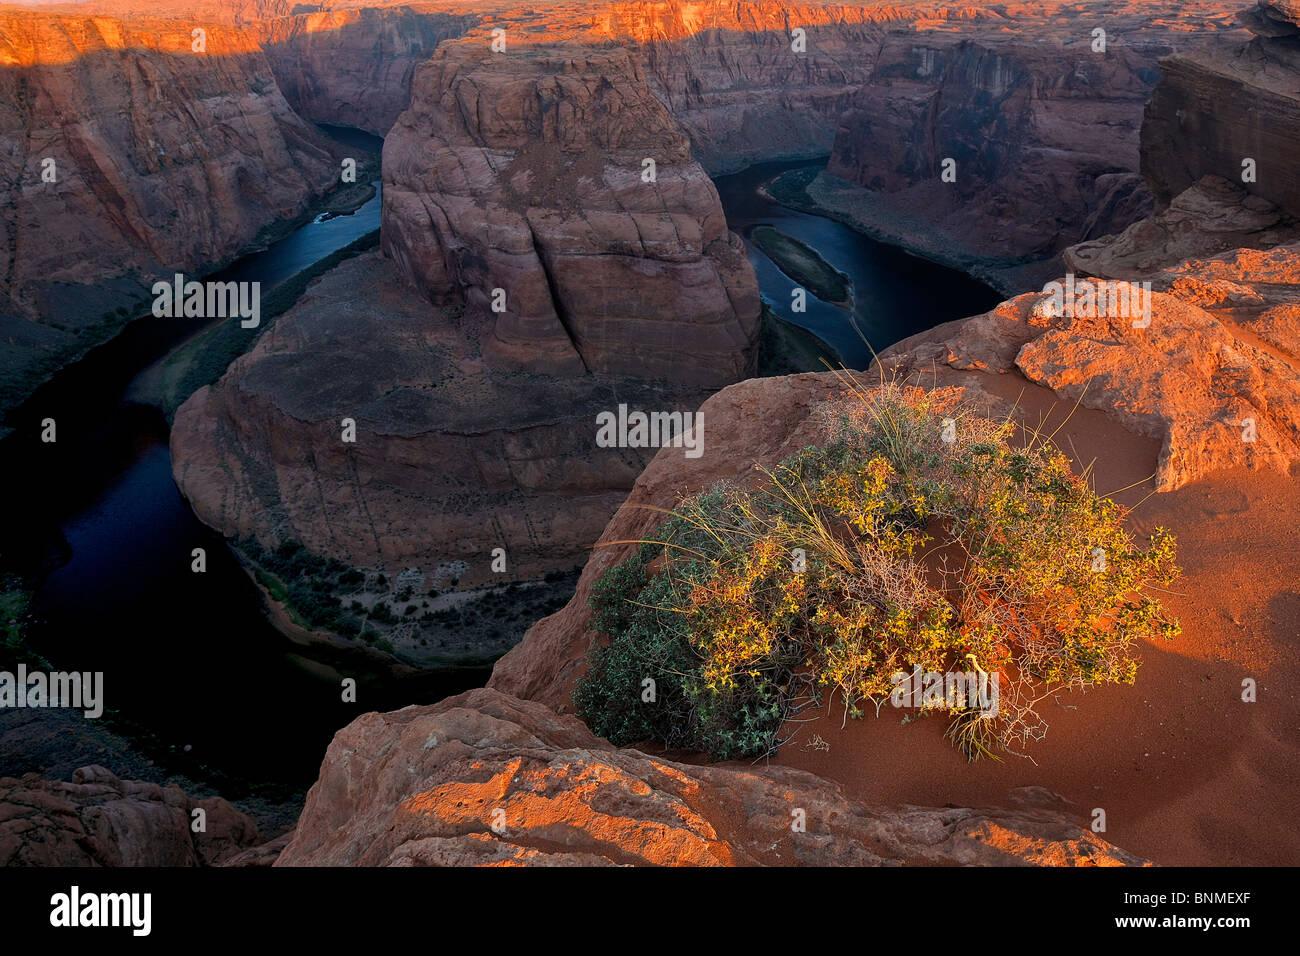 Erste Licht entlang des Randes des Horseshoe Bend als Colorado River fließt unten, Page, Arizona, USA. Stockbild